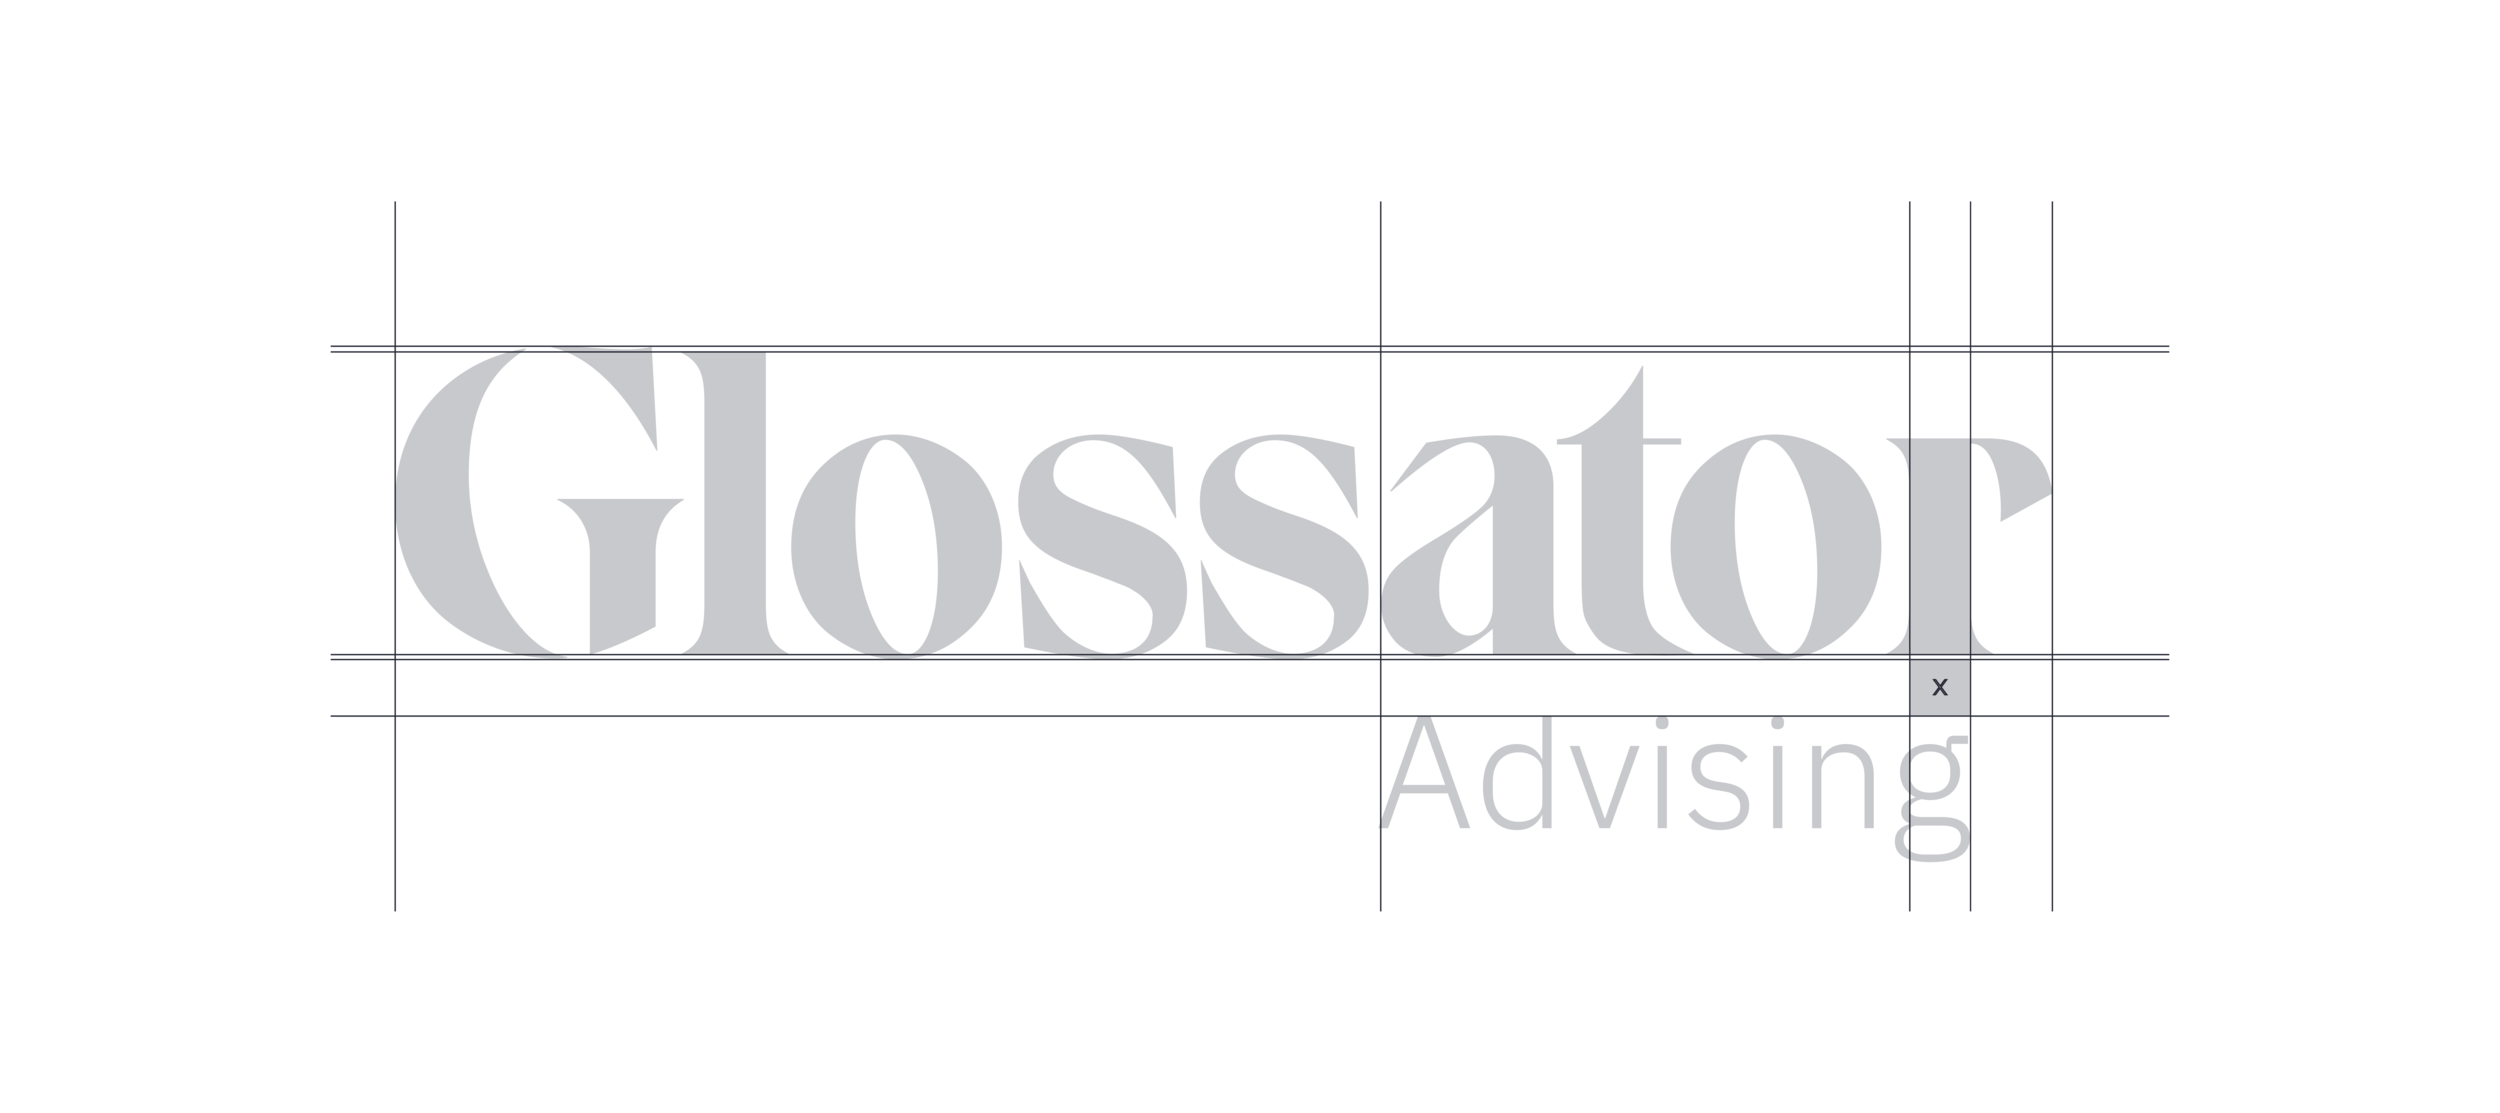 glossator_nds-02.png